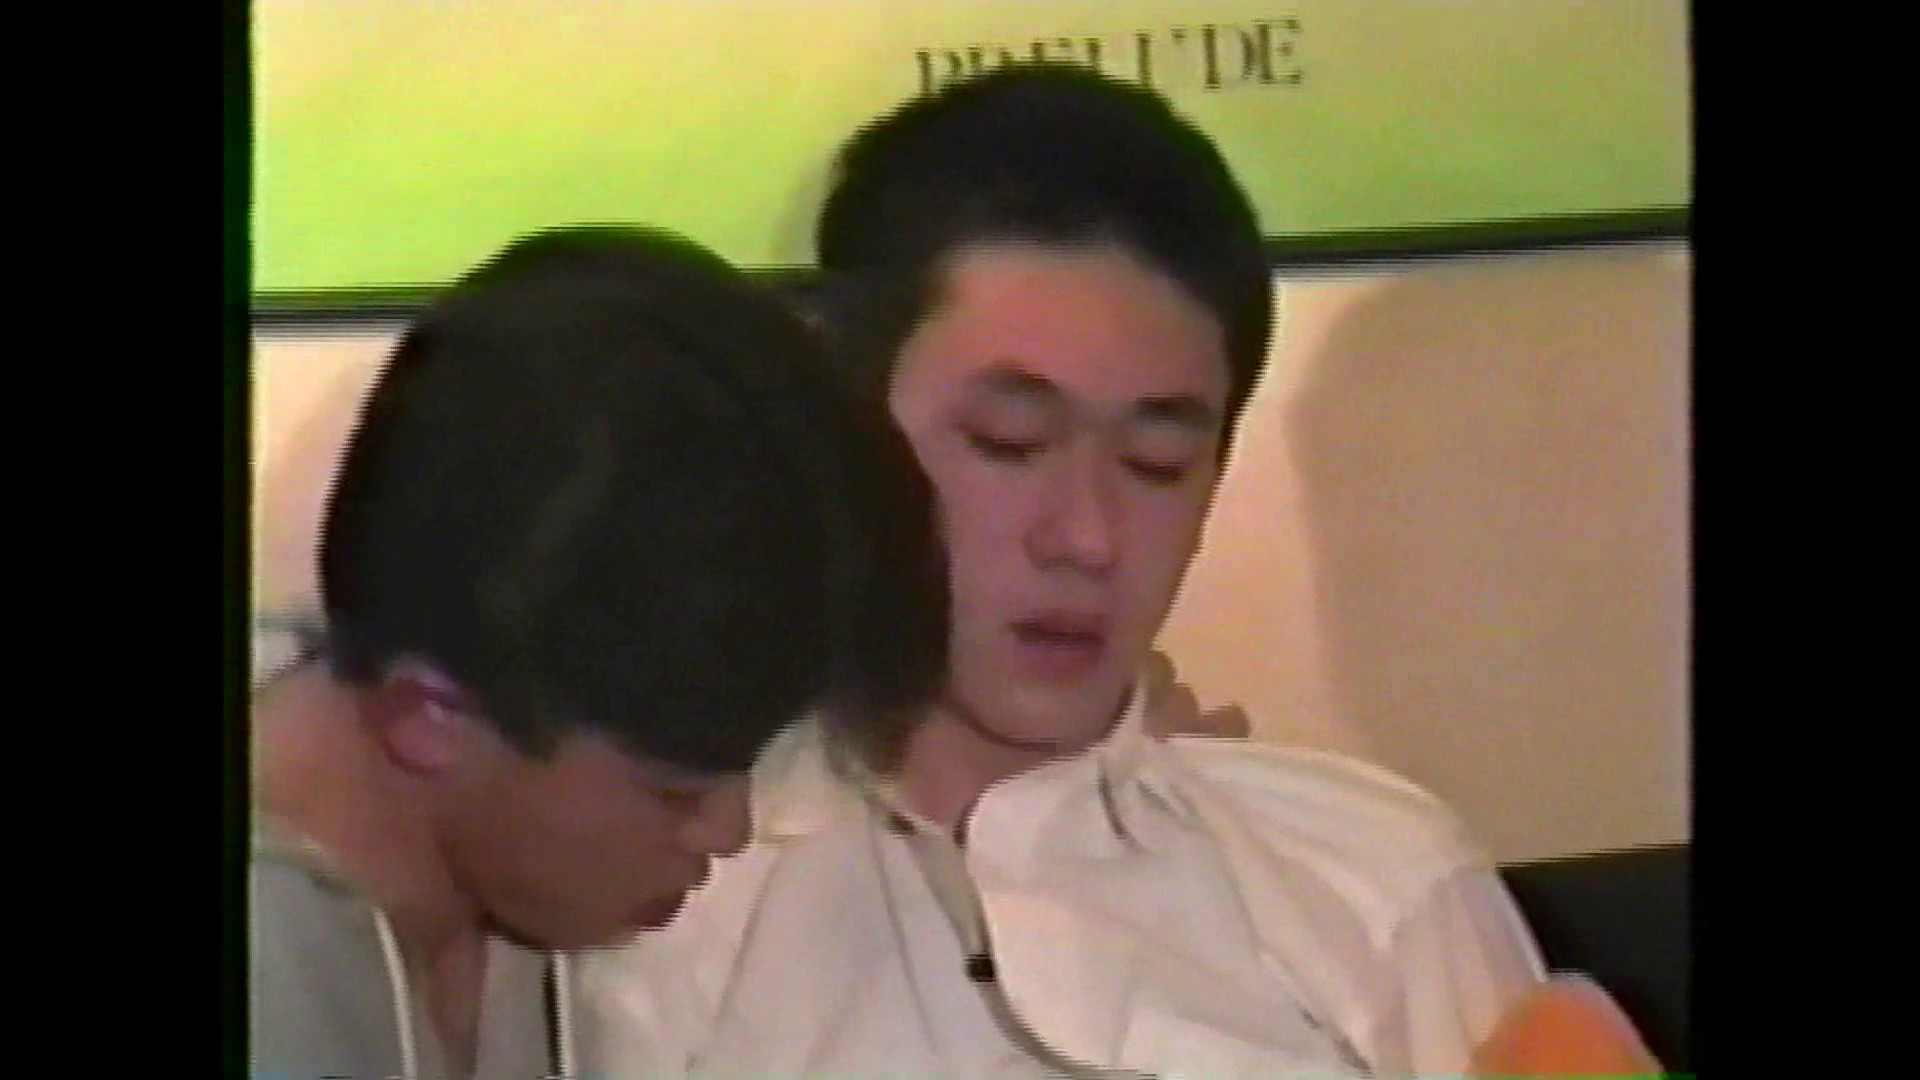 GAYBOY宏のオカズ倉庫Vol.2-1 手コキ ゲイモロ画像 64pic 22